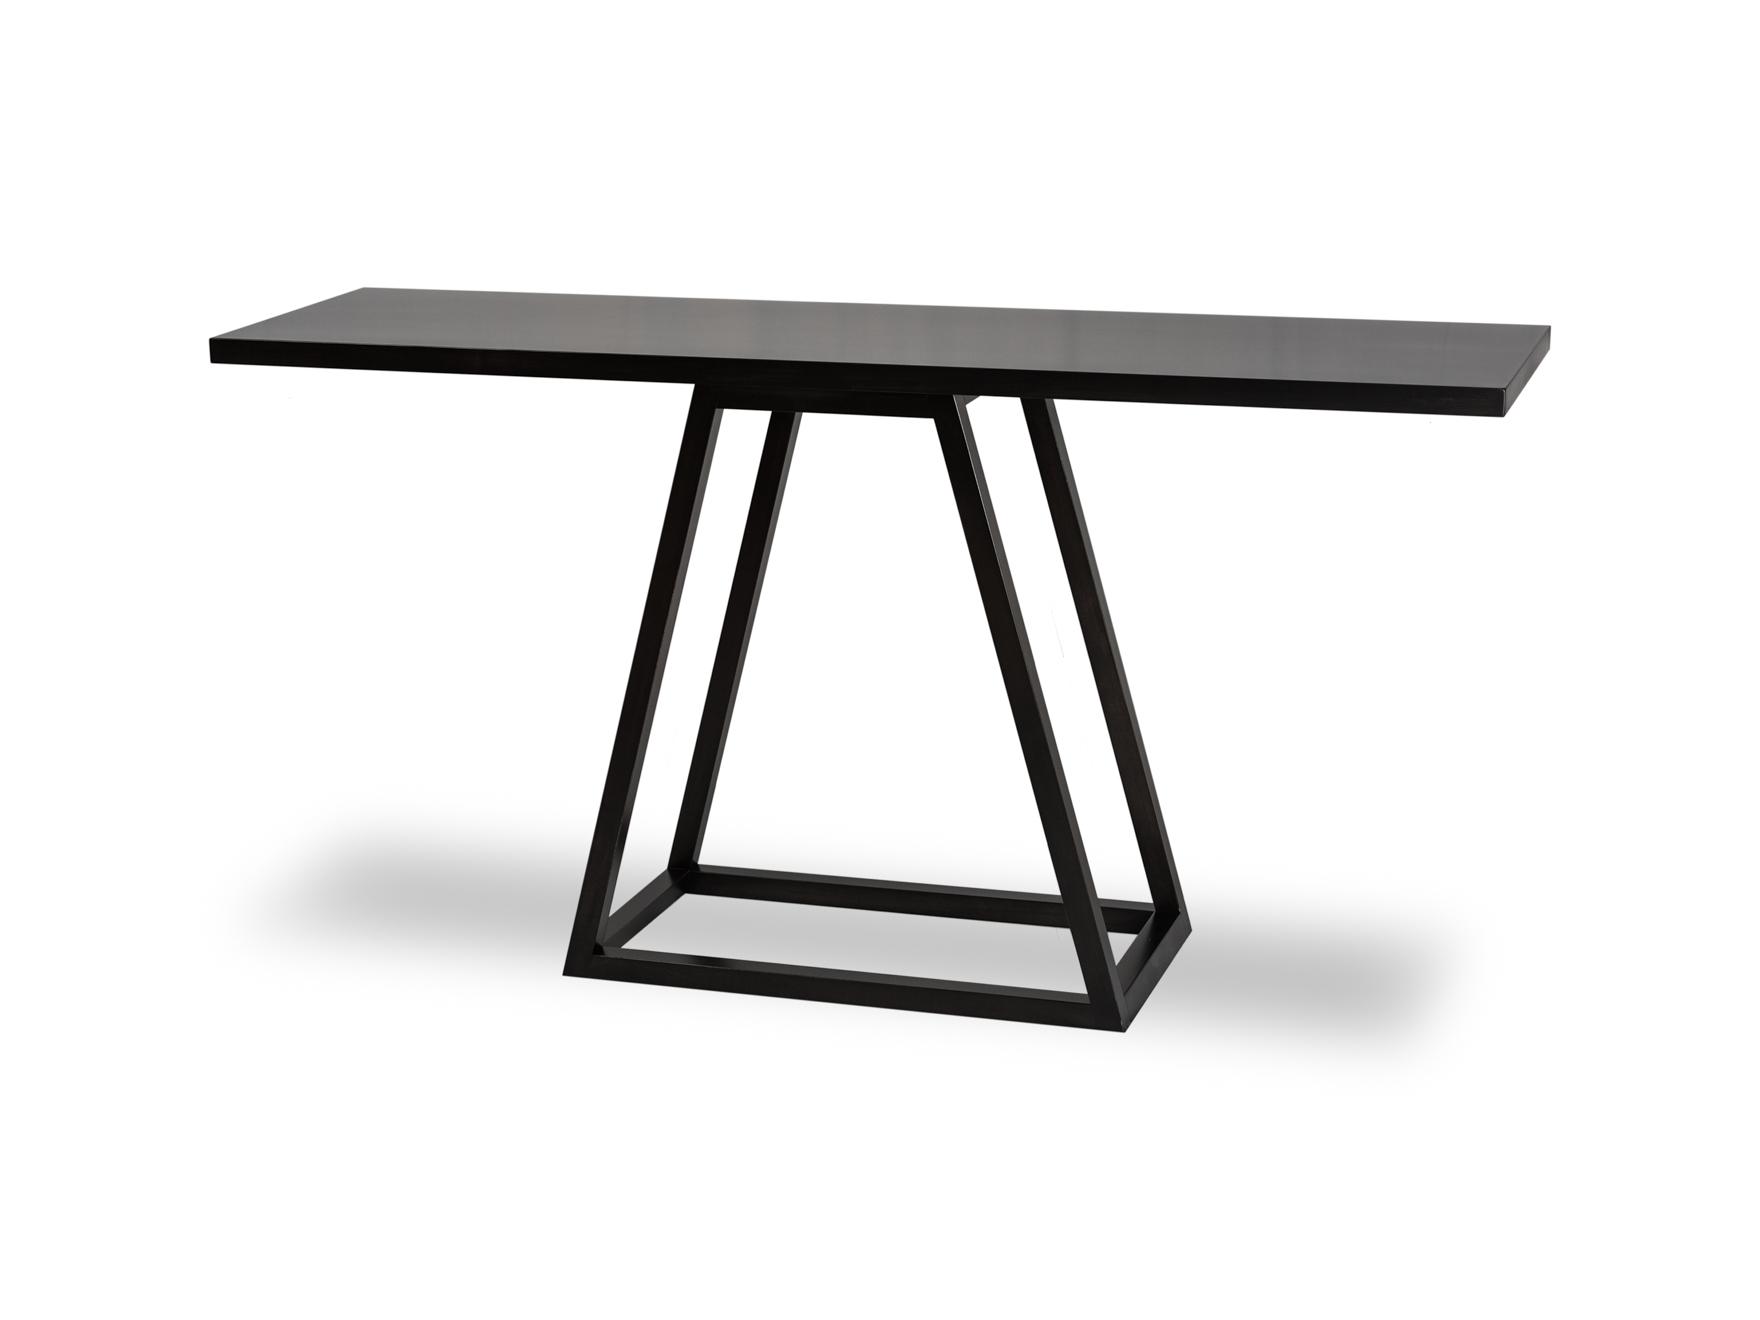 005_Woodcraft_Furniture_AvenueSofaTable_QtrD.jpg